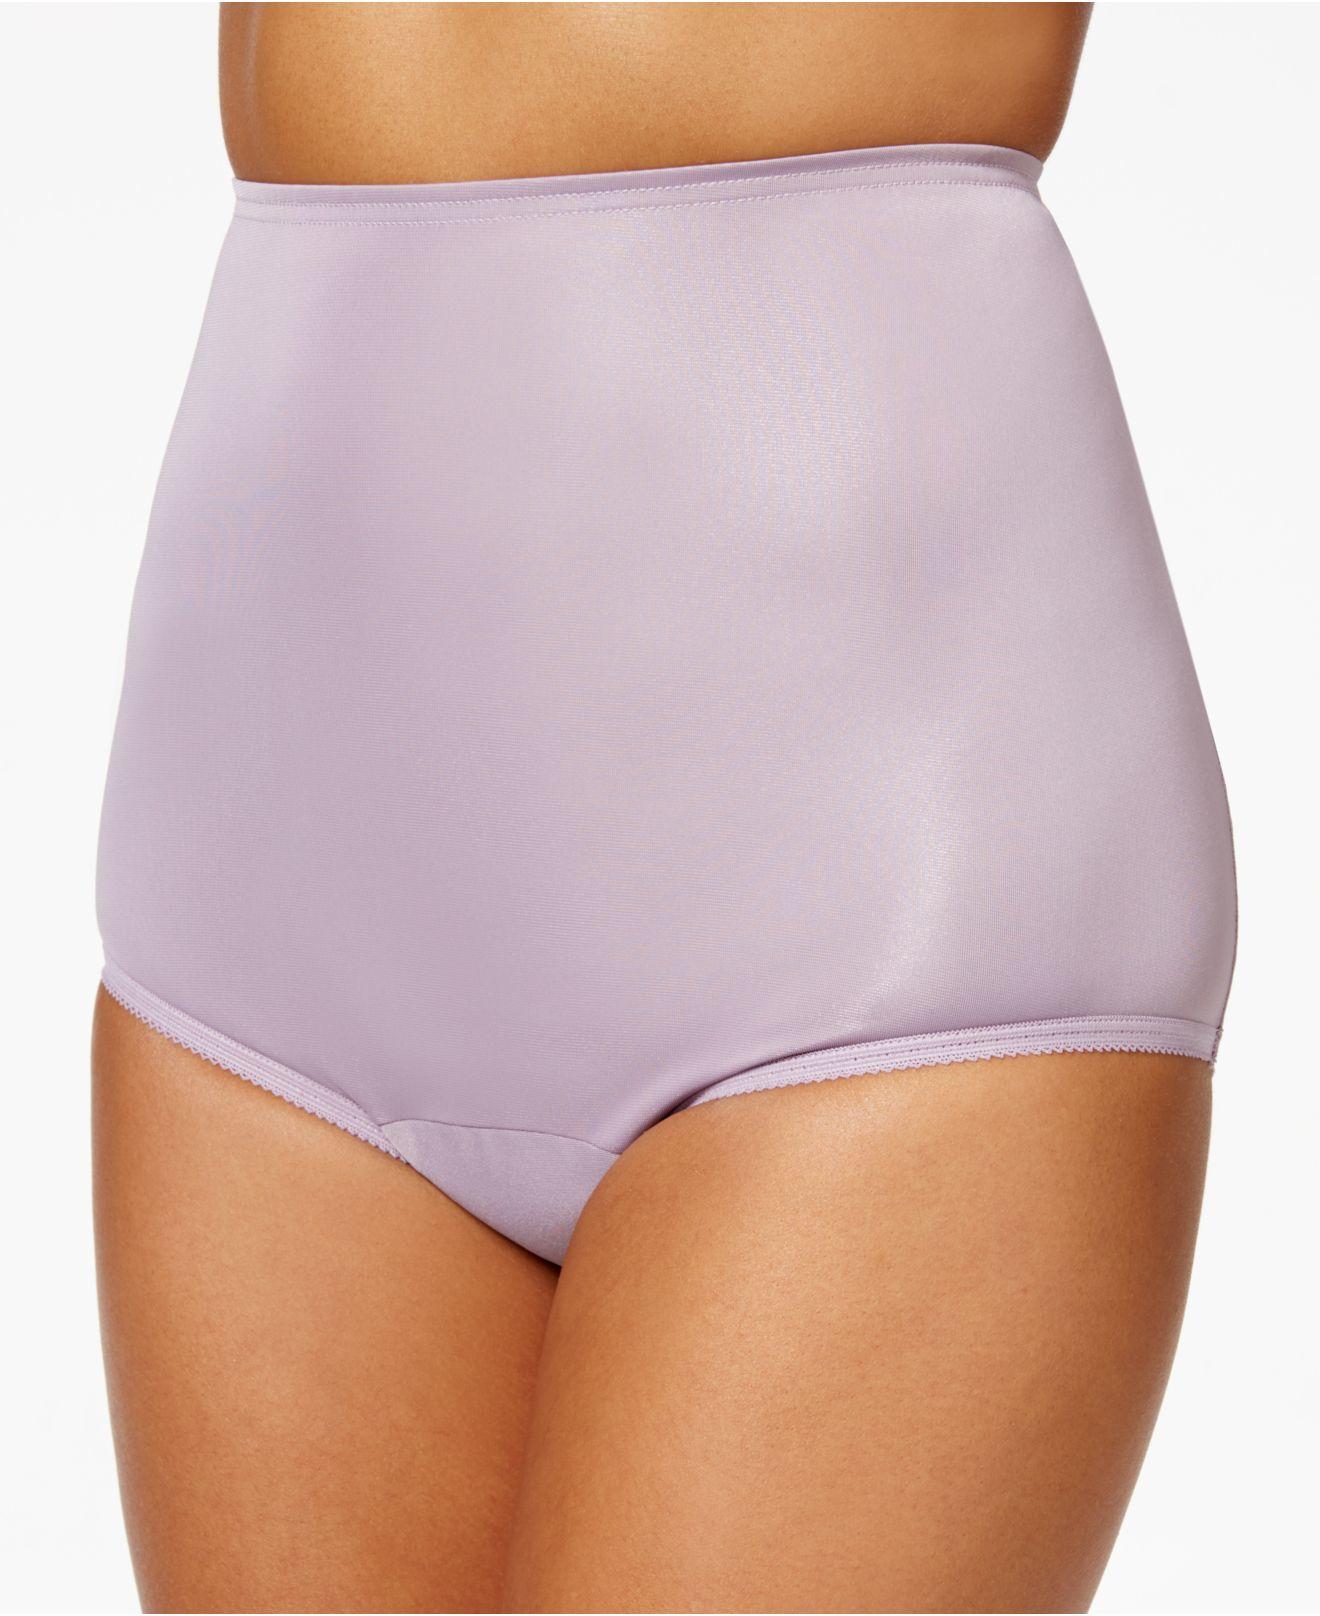 Vanity fair Perfectly Yours Ravissant Nylon Brief in Purple